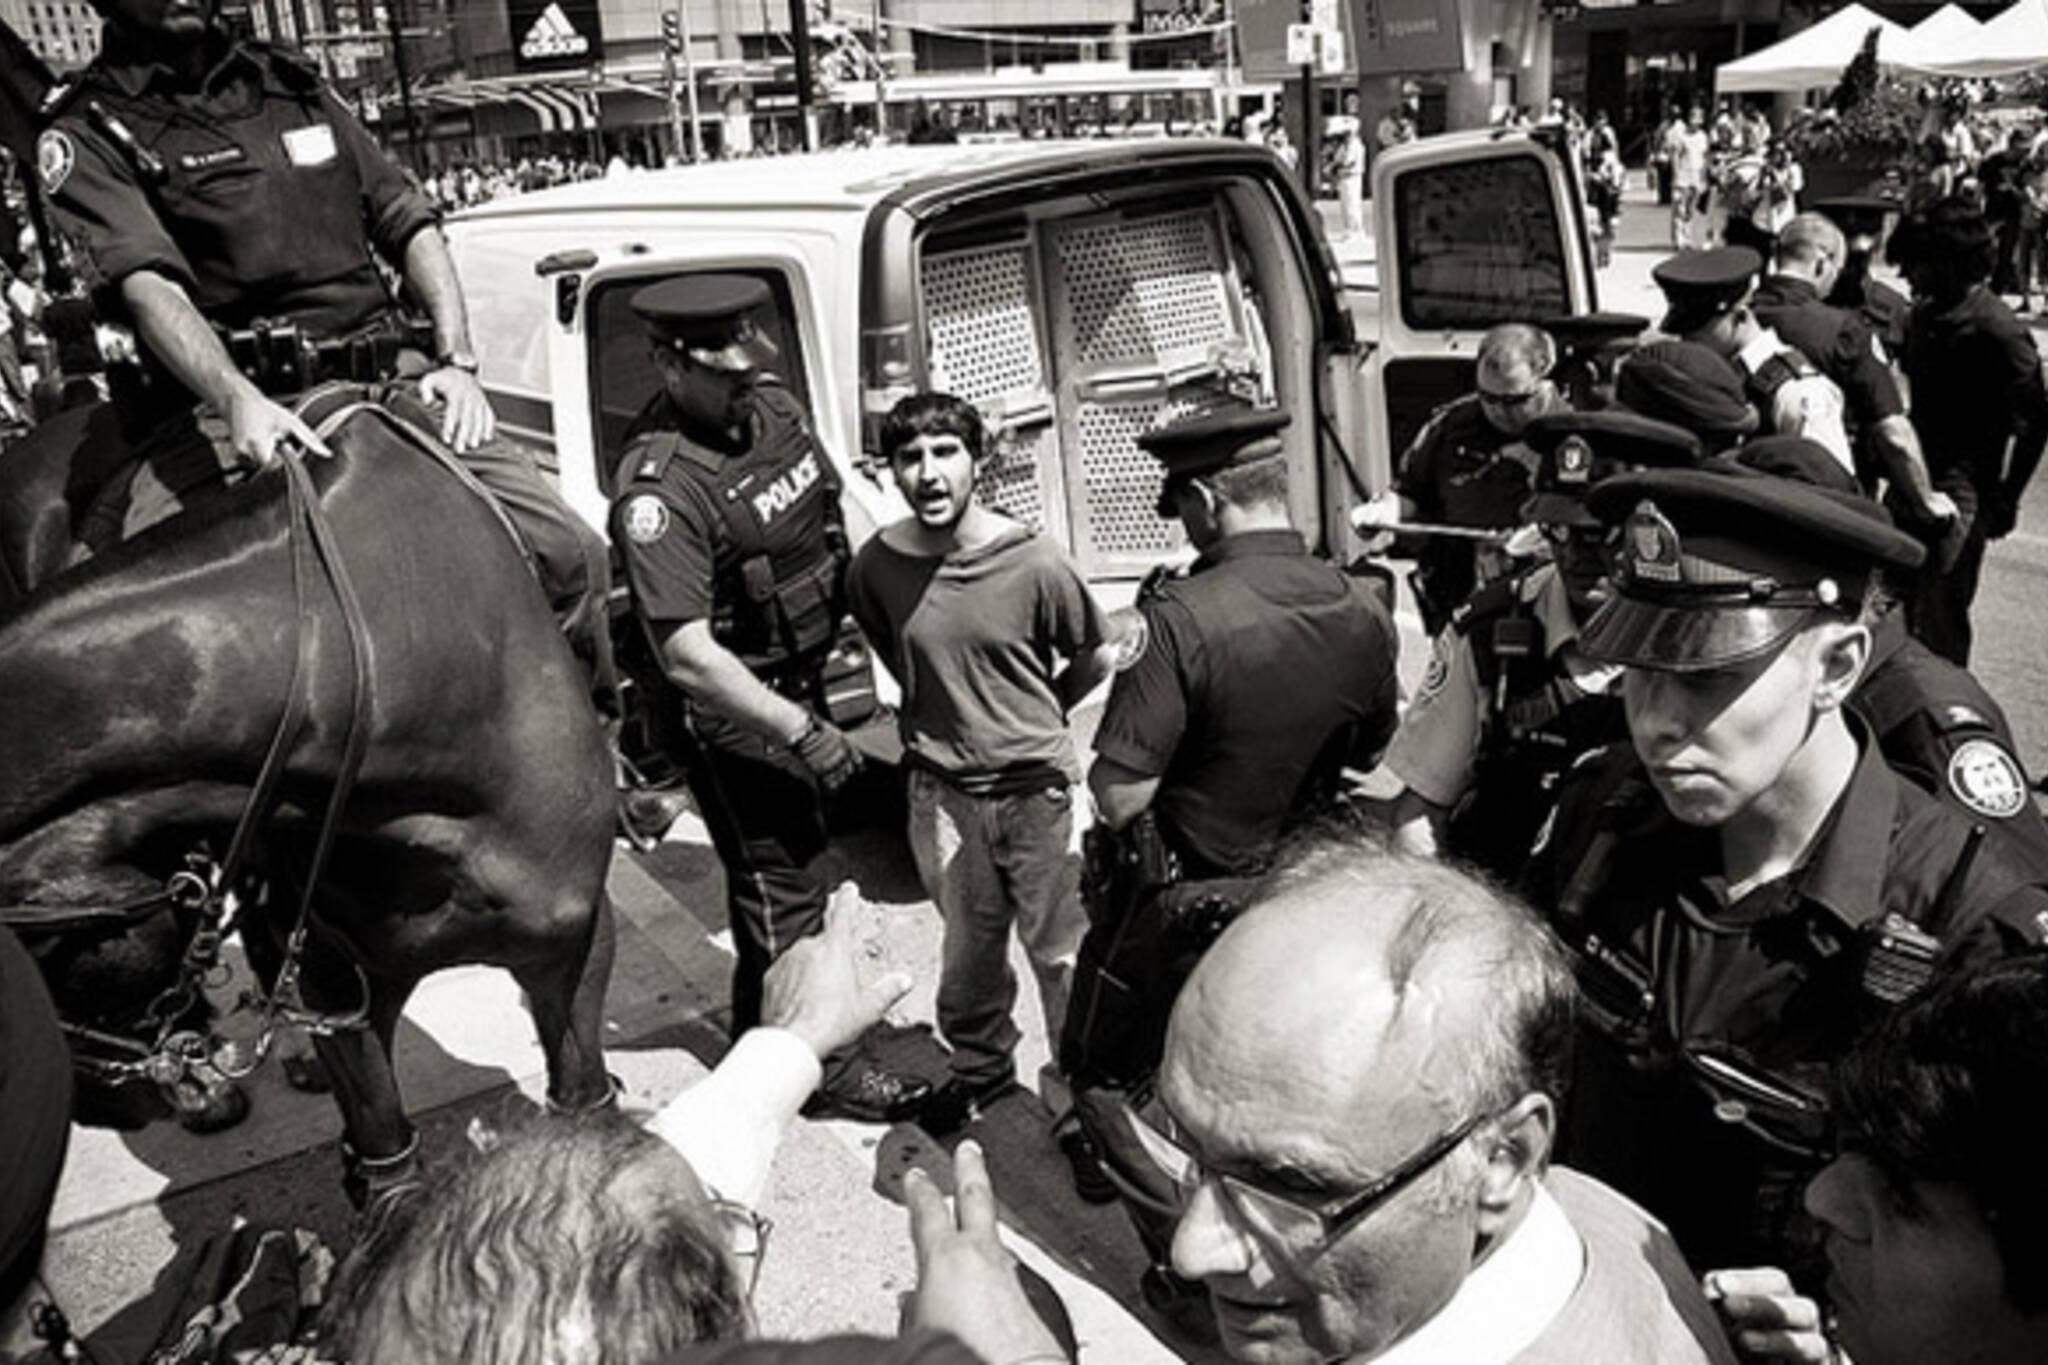 police, street, arrest